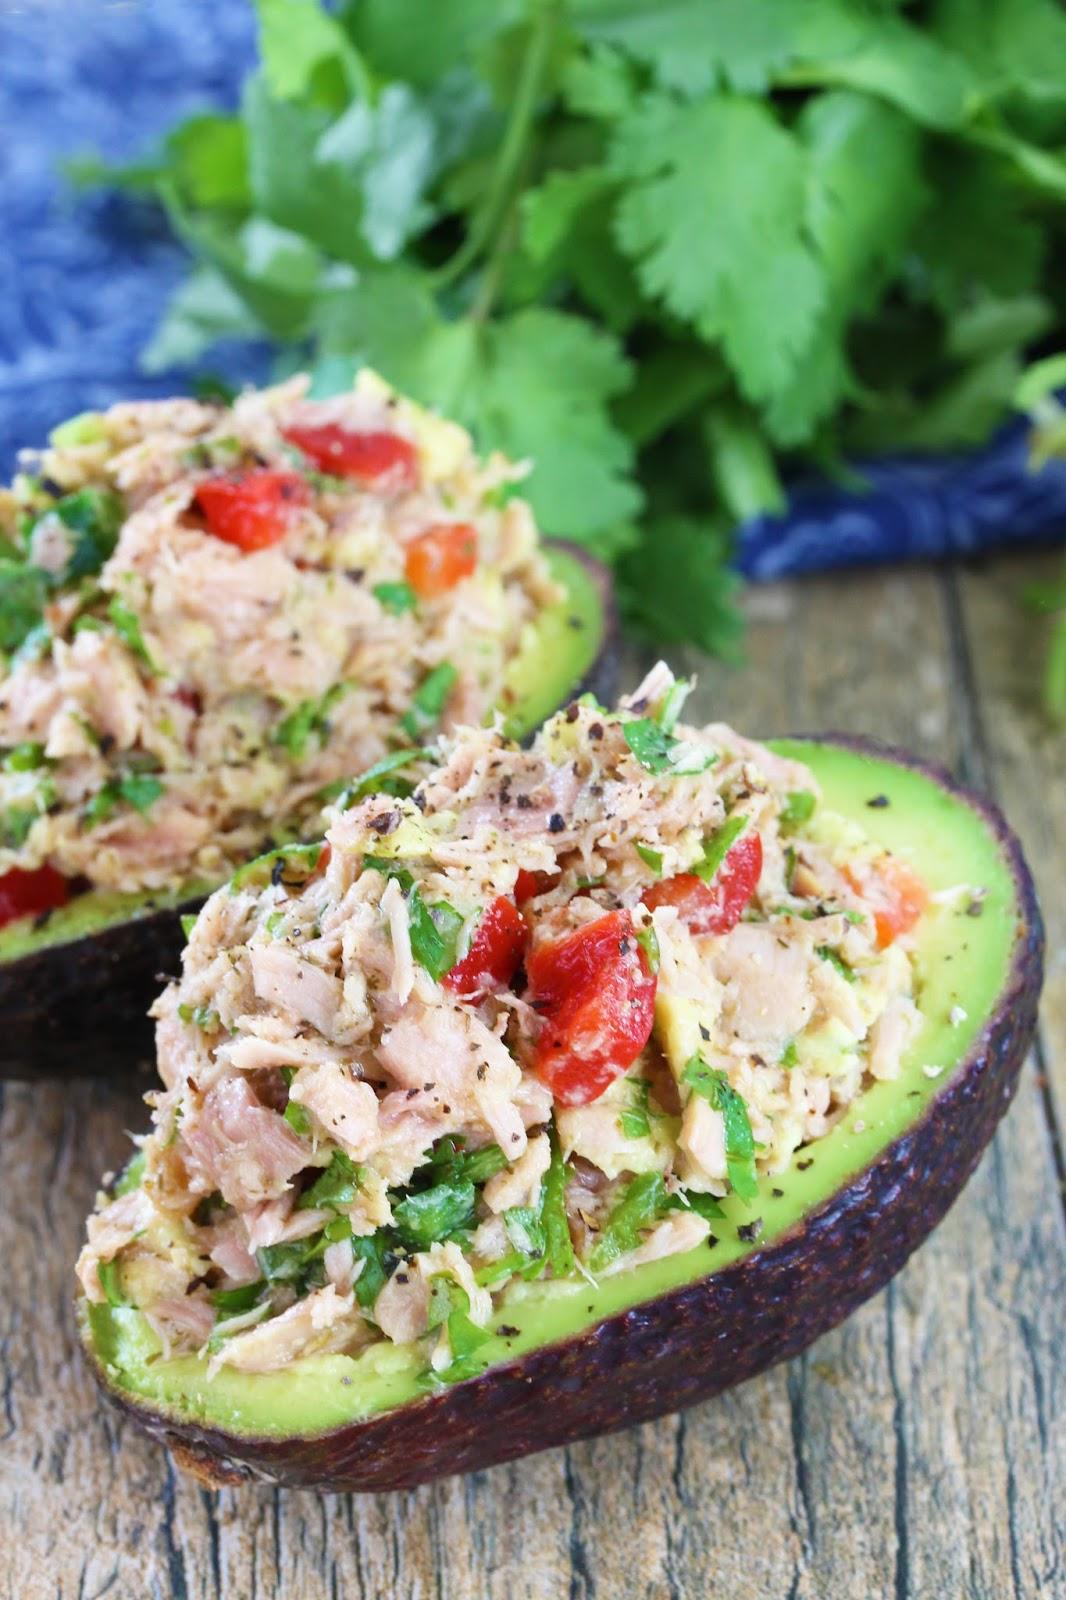 Healthy Tuna Stuffed Avocado 1